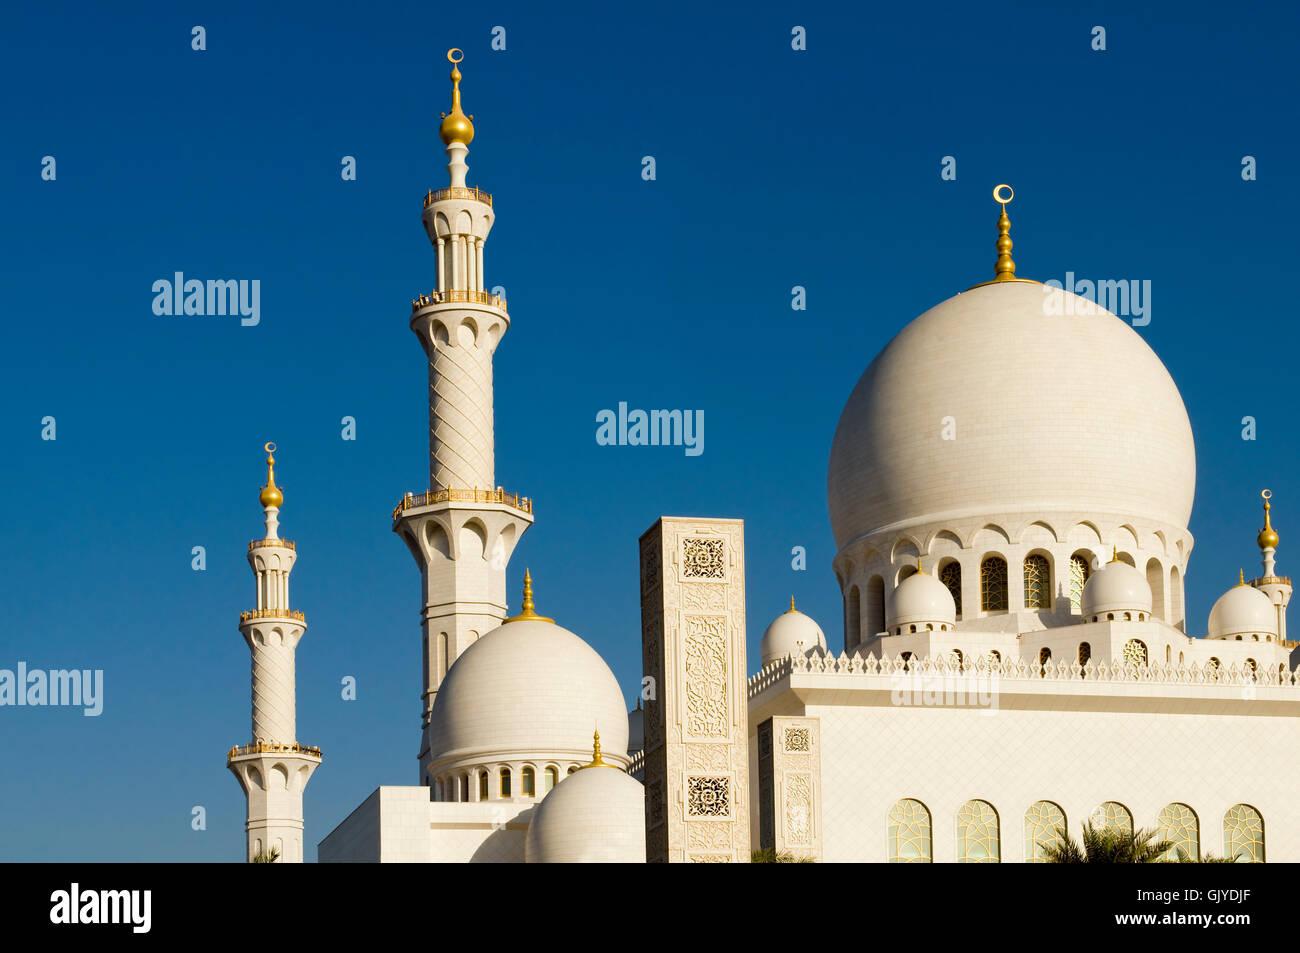 religion islam mosque - Stock Image